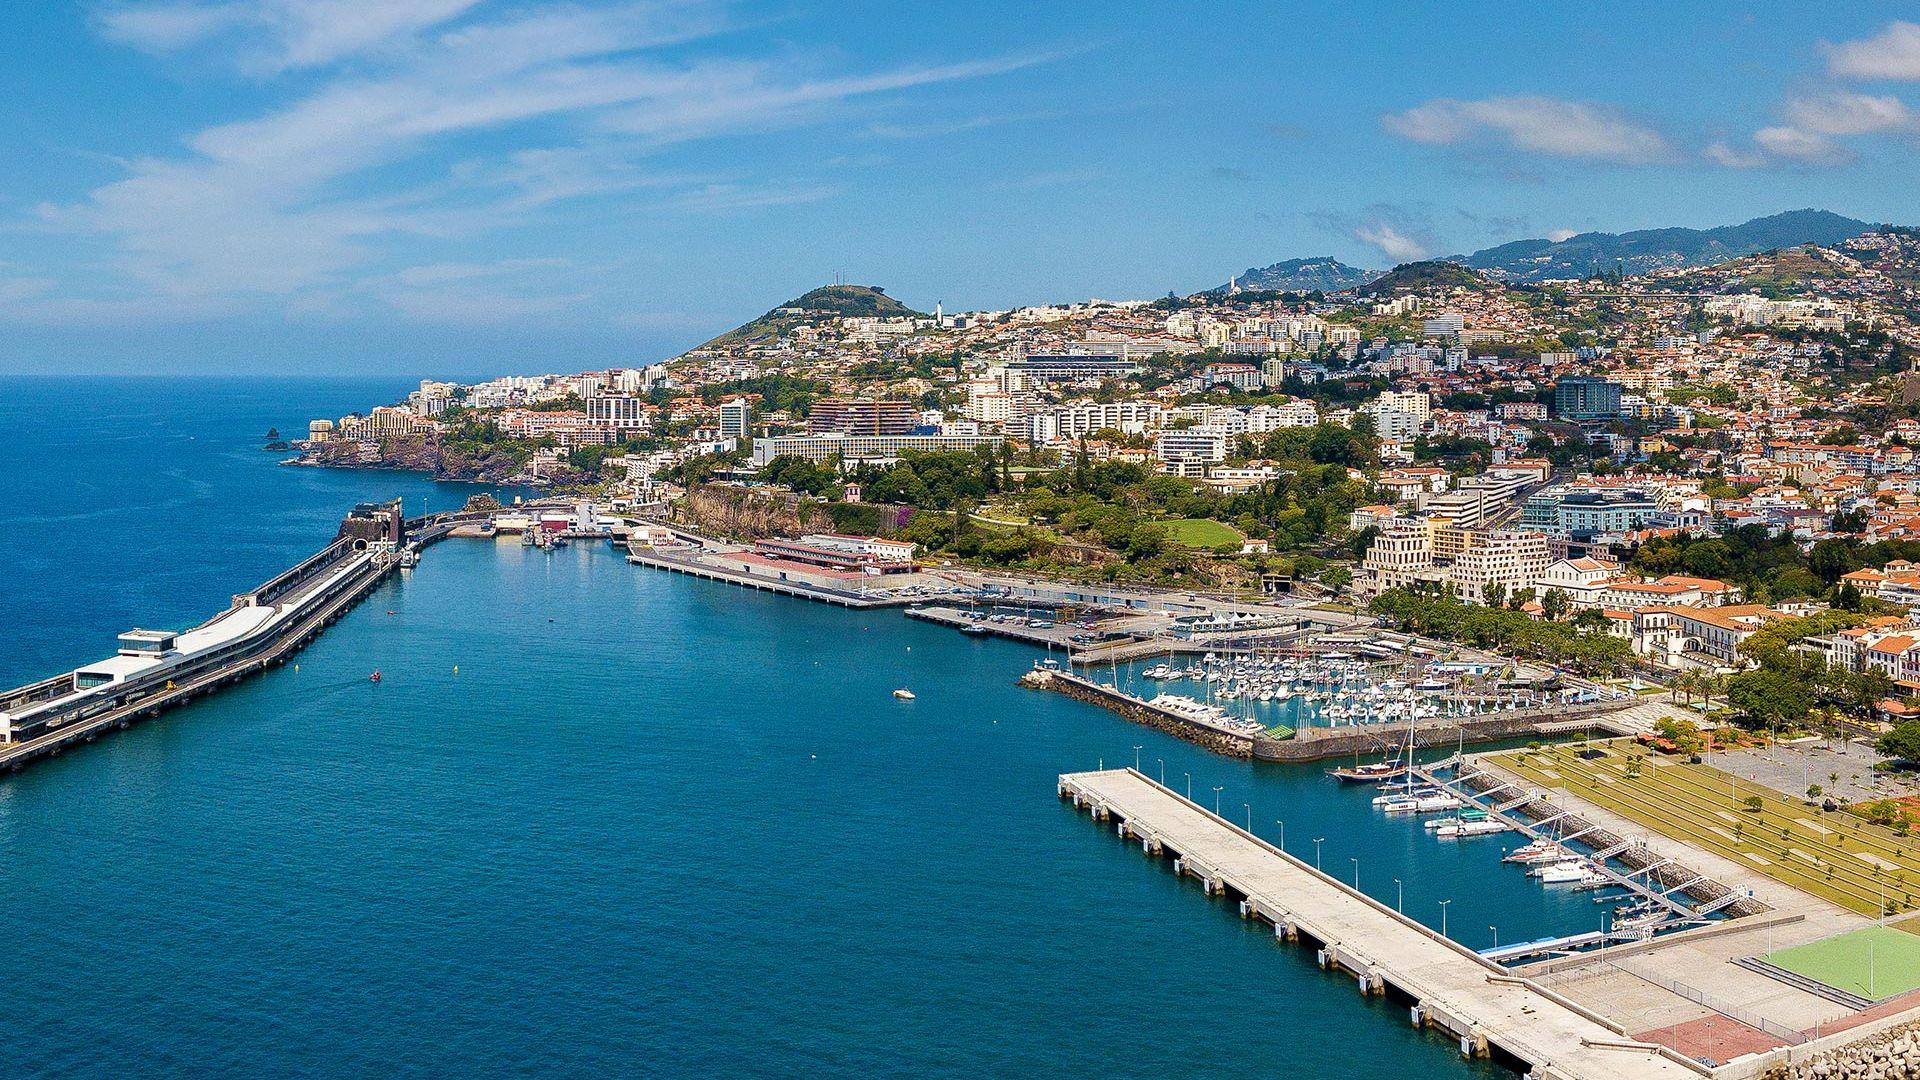 Sejur Charter Madeira, 8 zile - august 2021